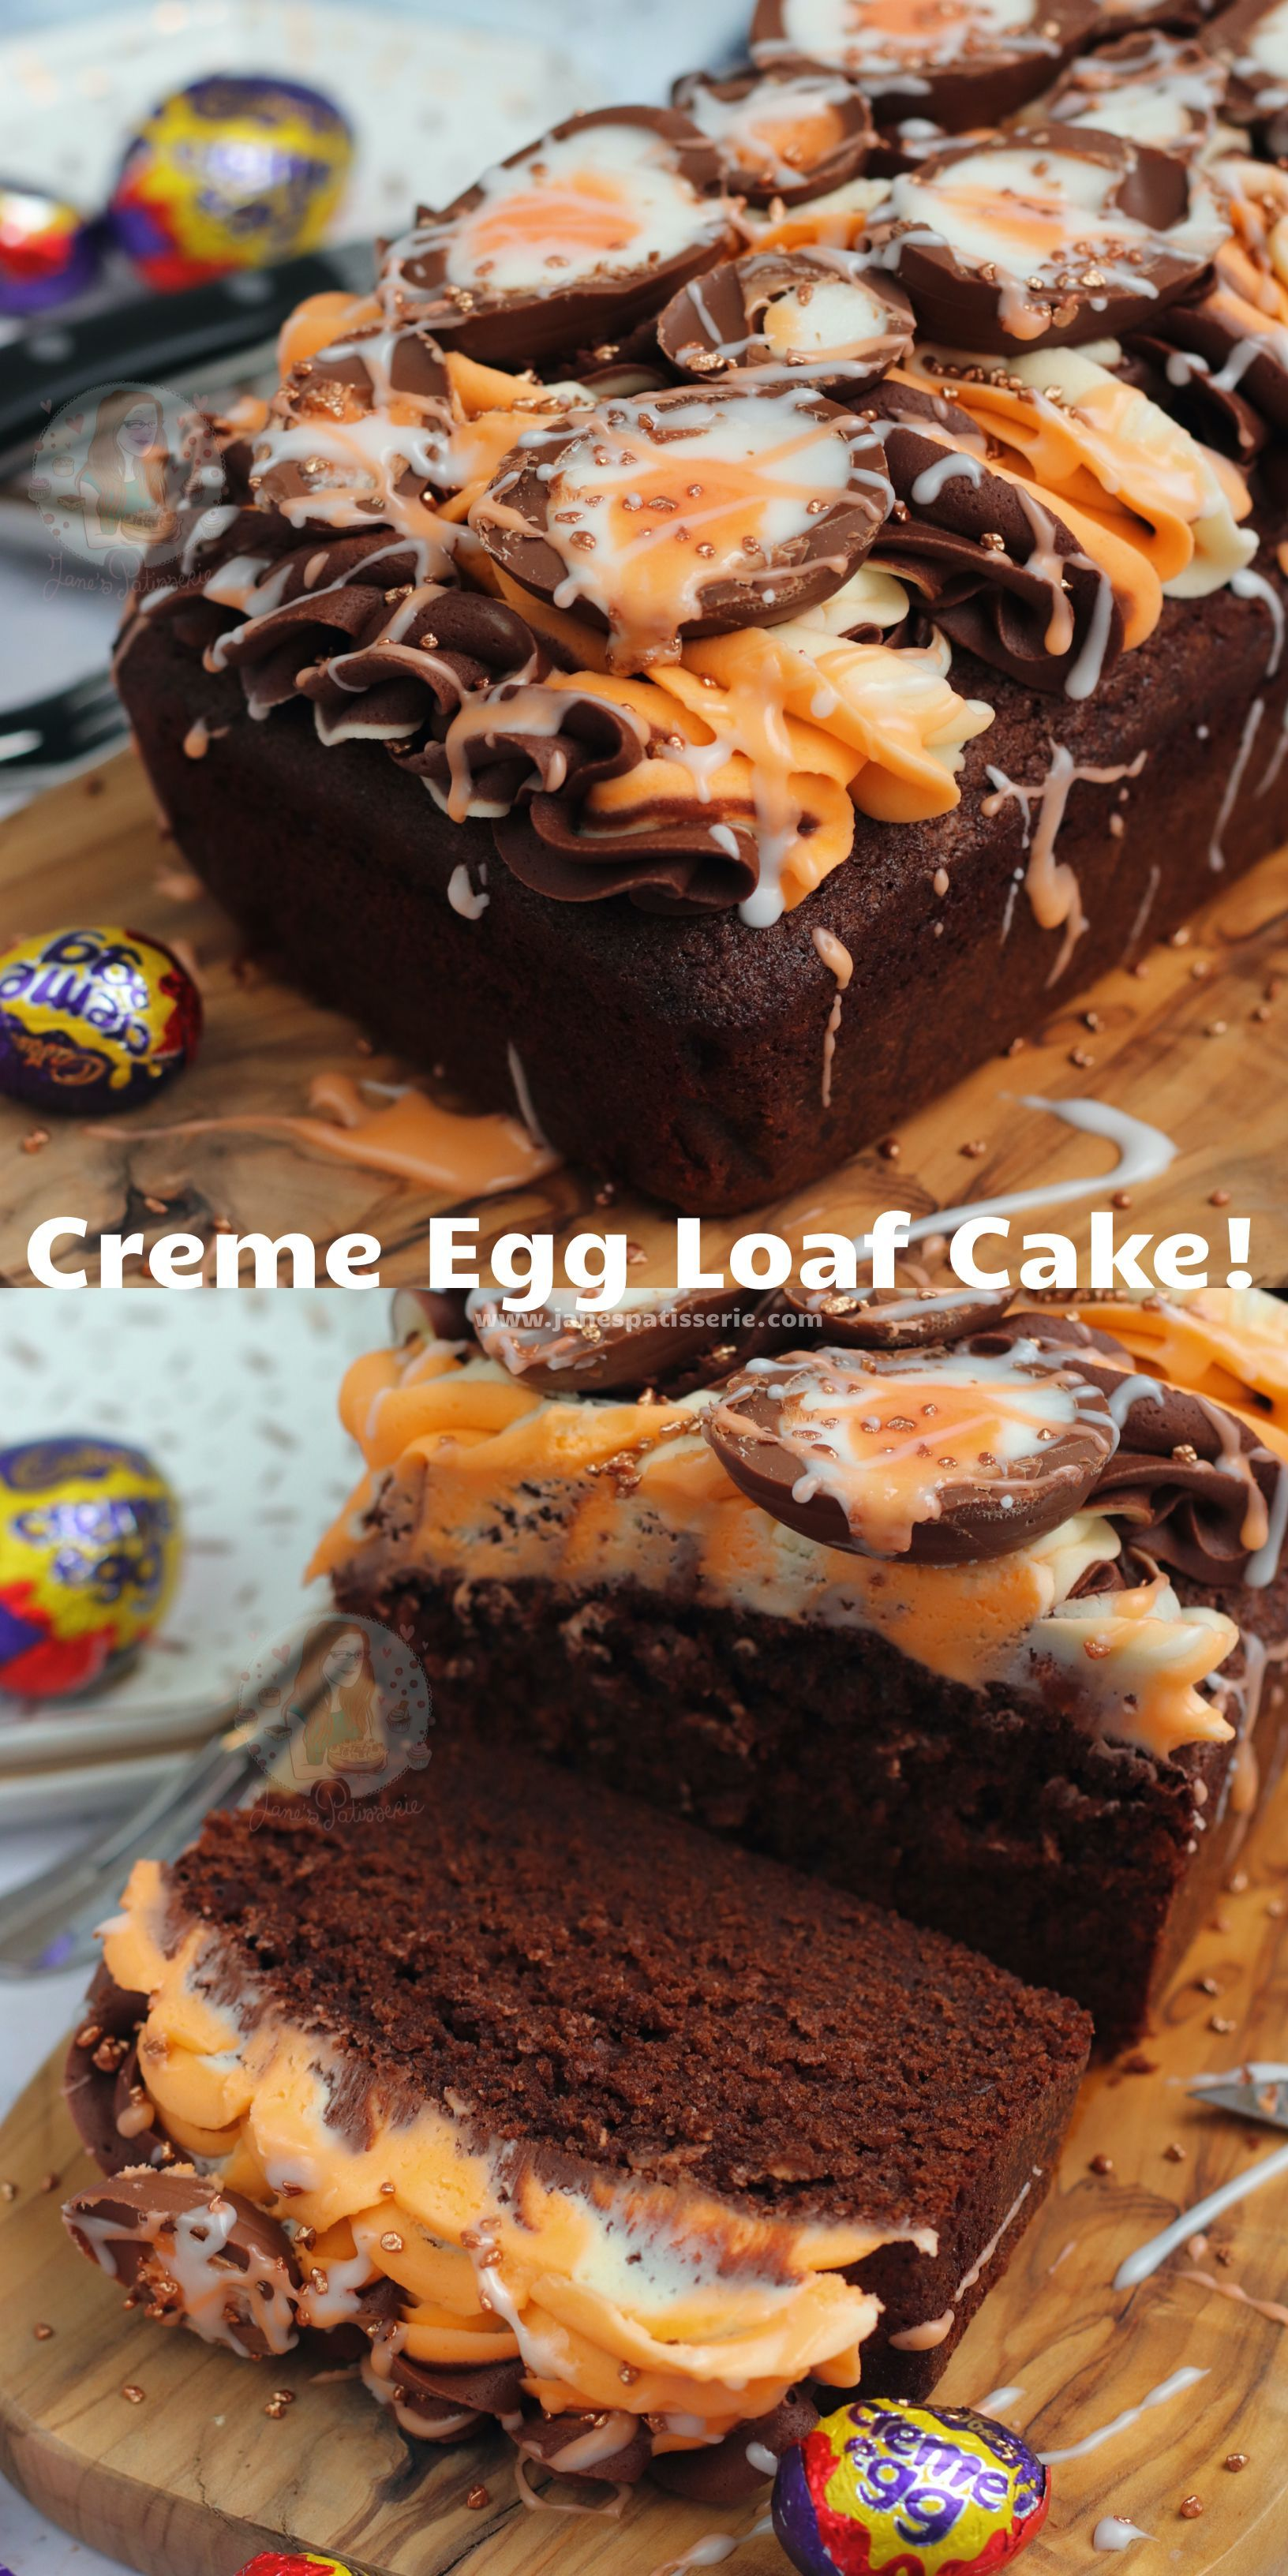 Photo of Creme Egg Loaf Cake!